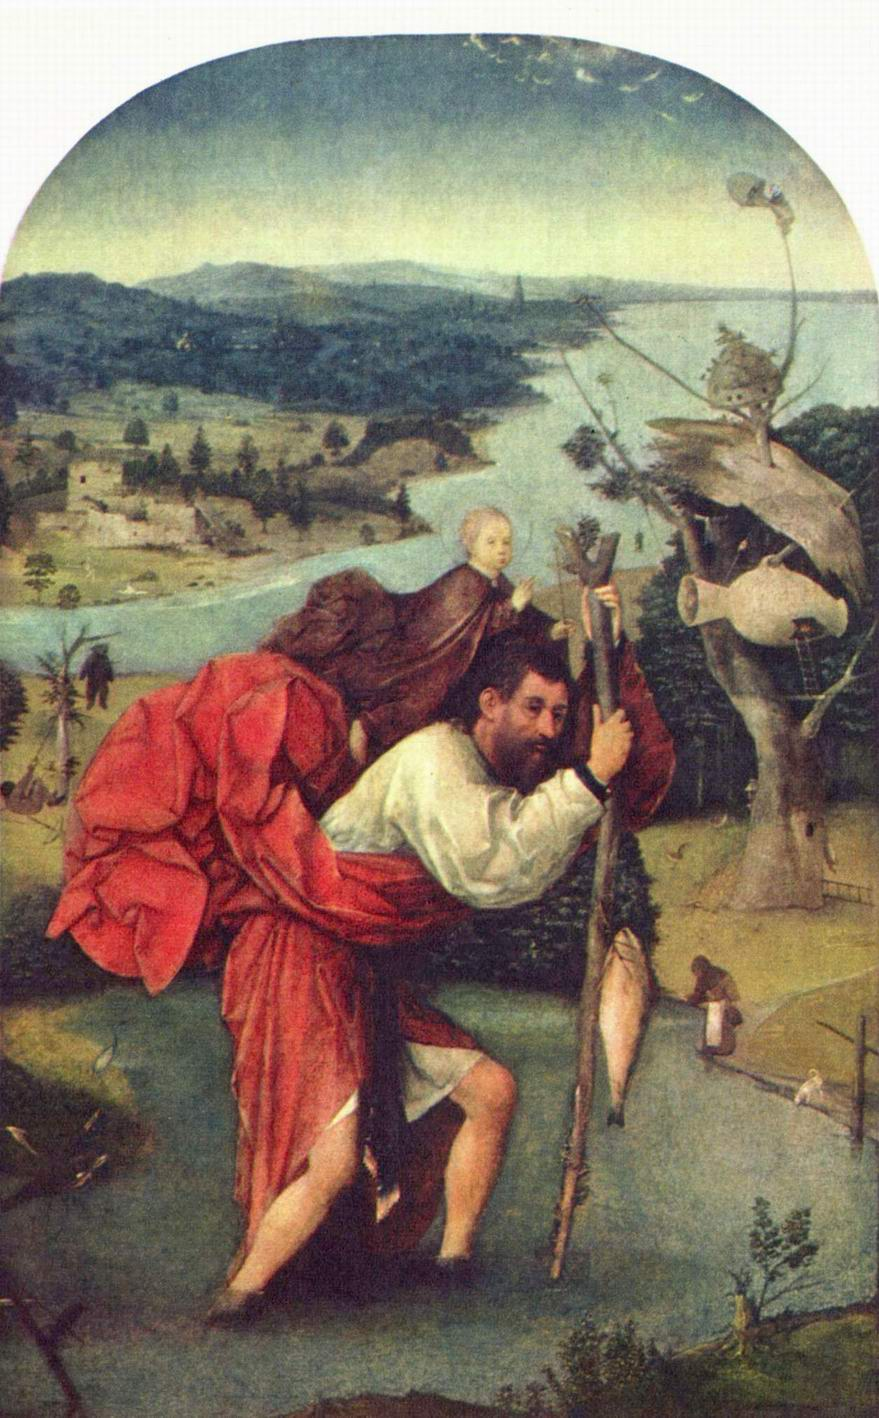 Св. Христофор, Босх Иероним